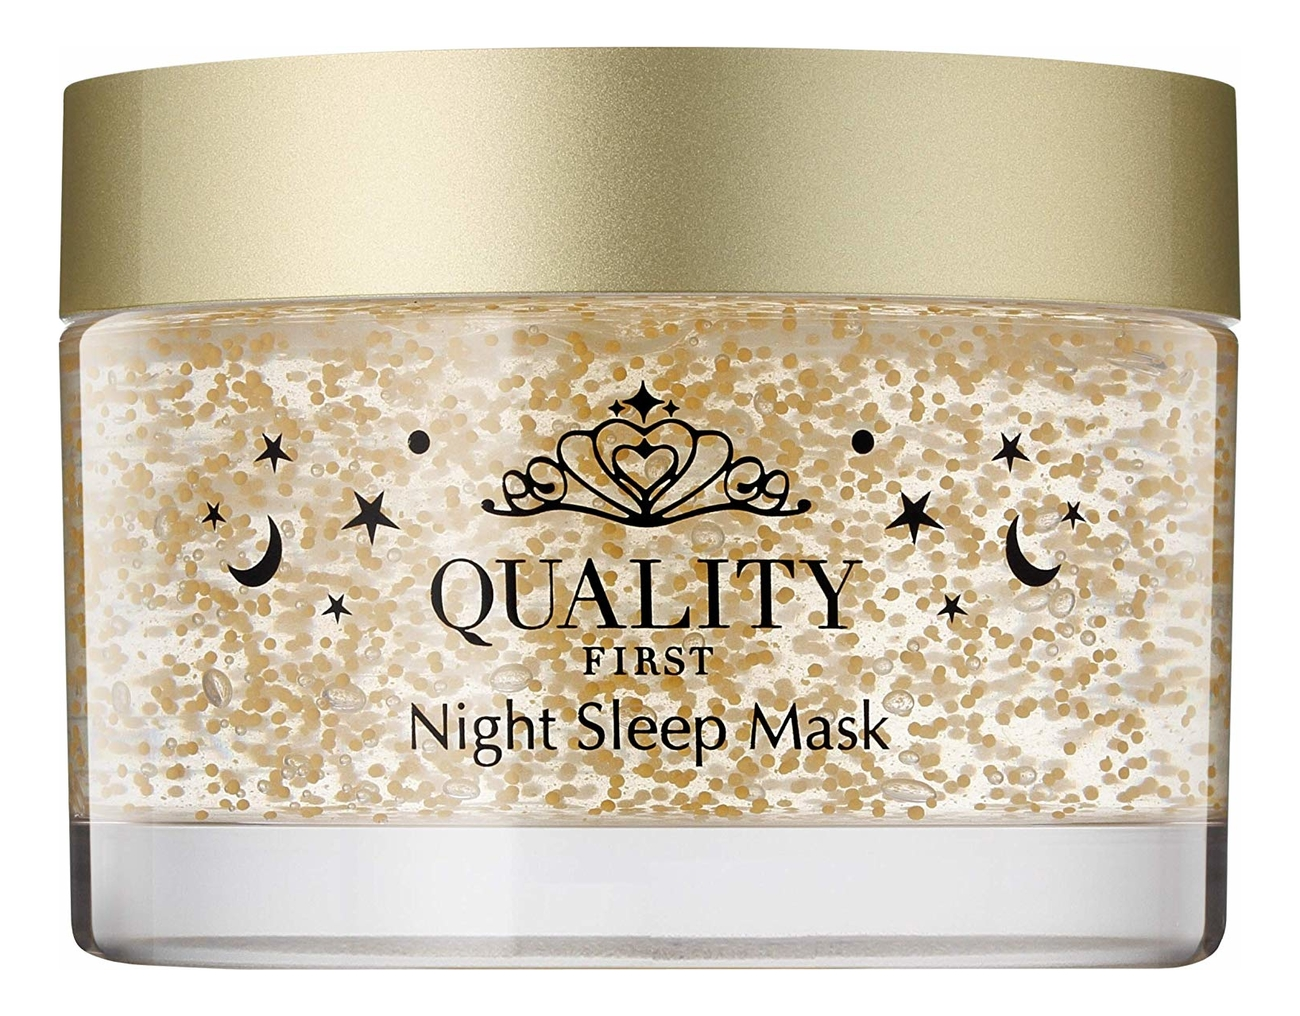 Премиальная ночная маска для лица Premium Mask Night Sleep Mask 80г, Quality 1st  - Купить